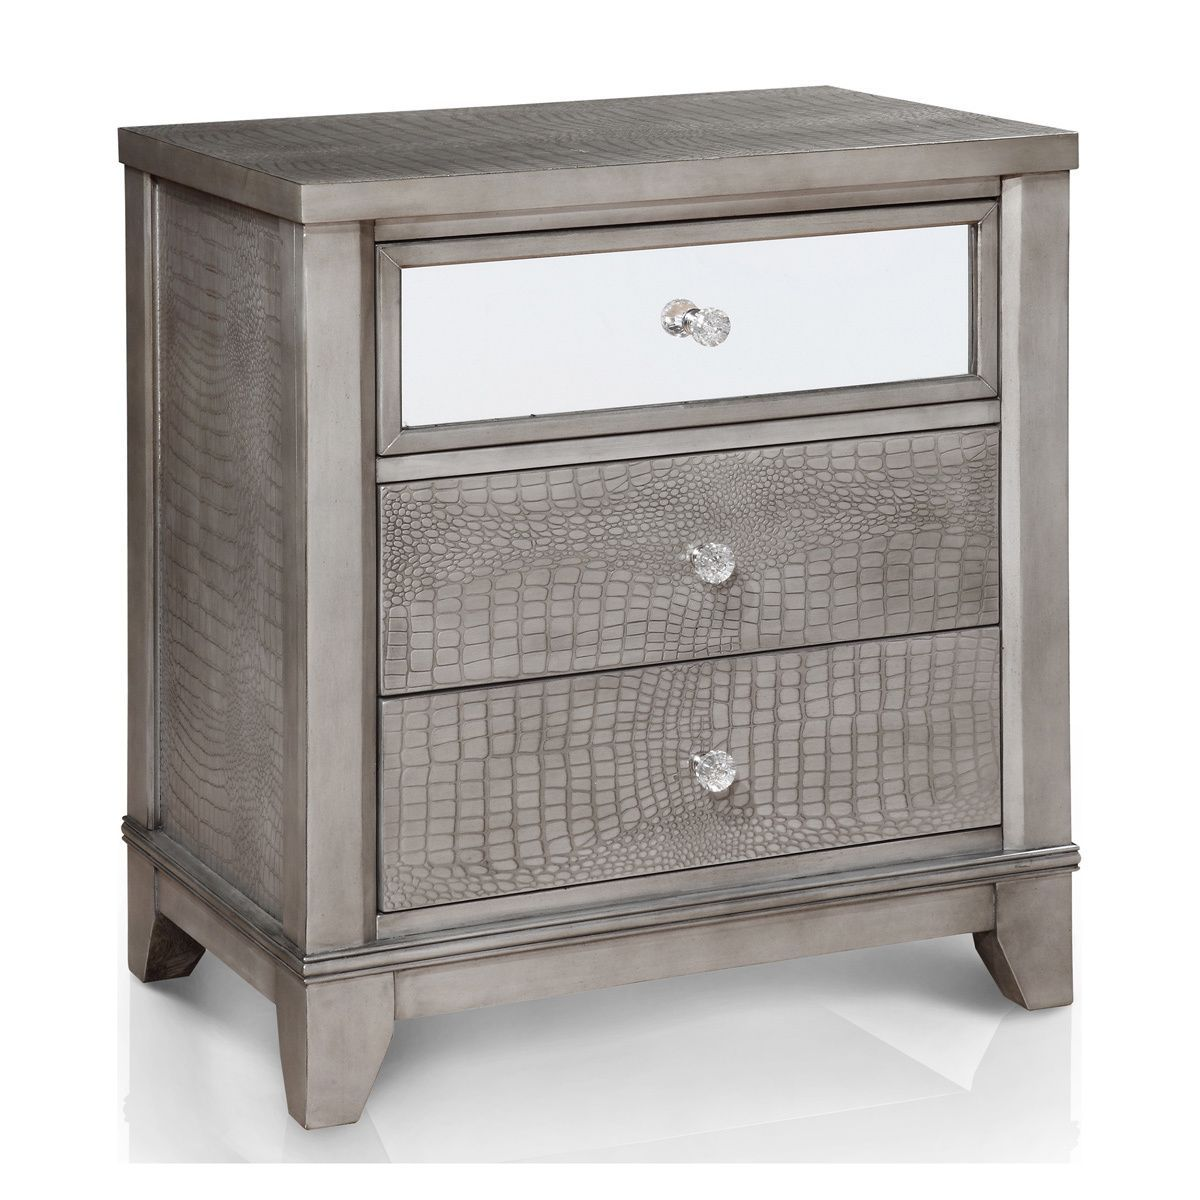 Furniture Of America Kivo Modern Silver Solid Wood 3 Drawer Nightstand Mirrored Nightstand Nightstand 3 Drawer Nightstand